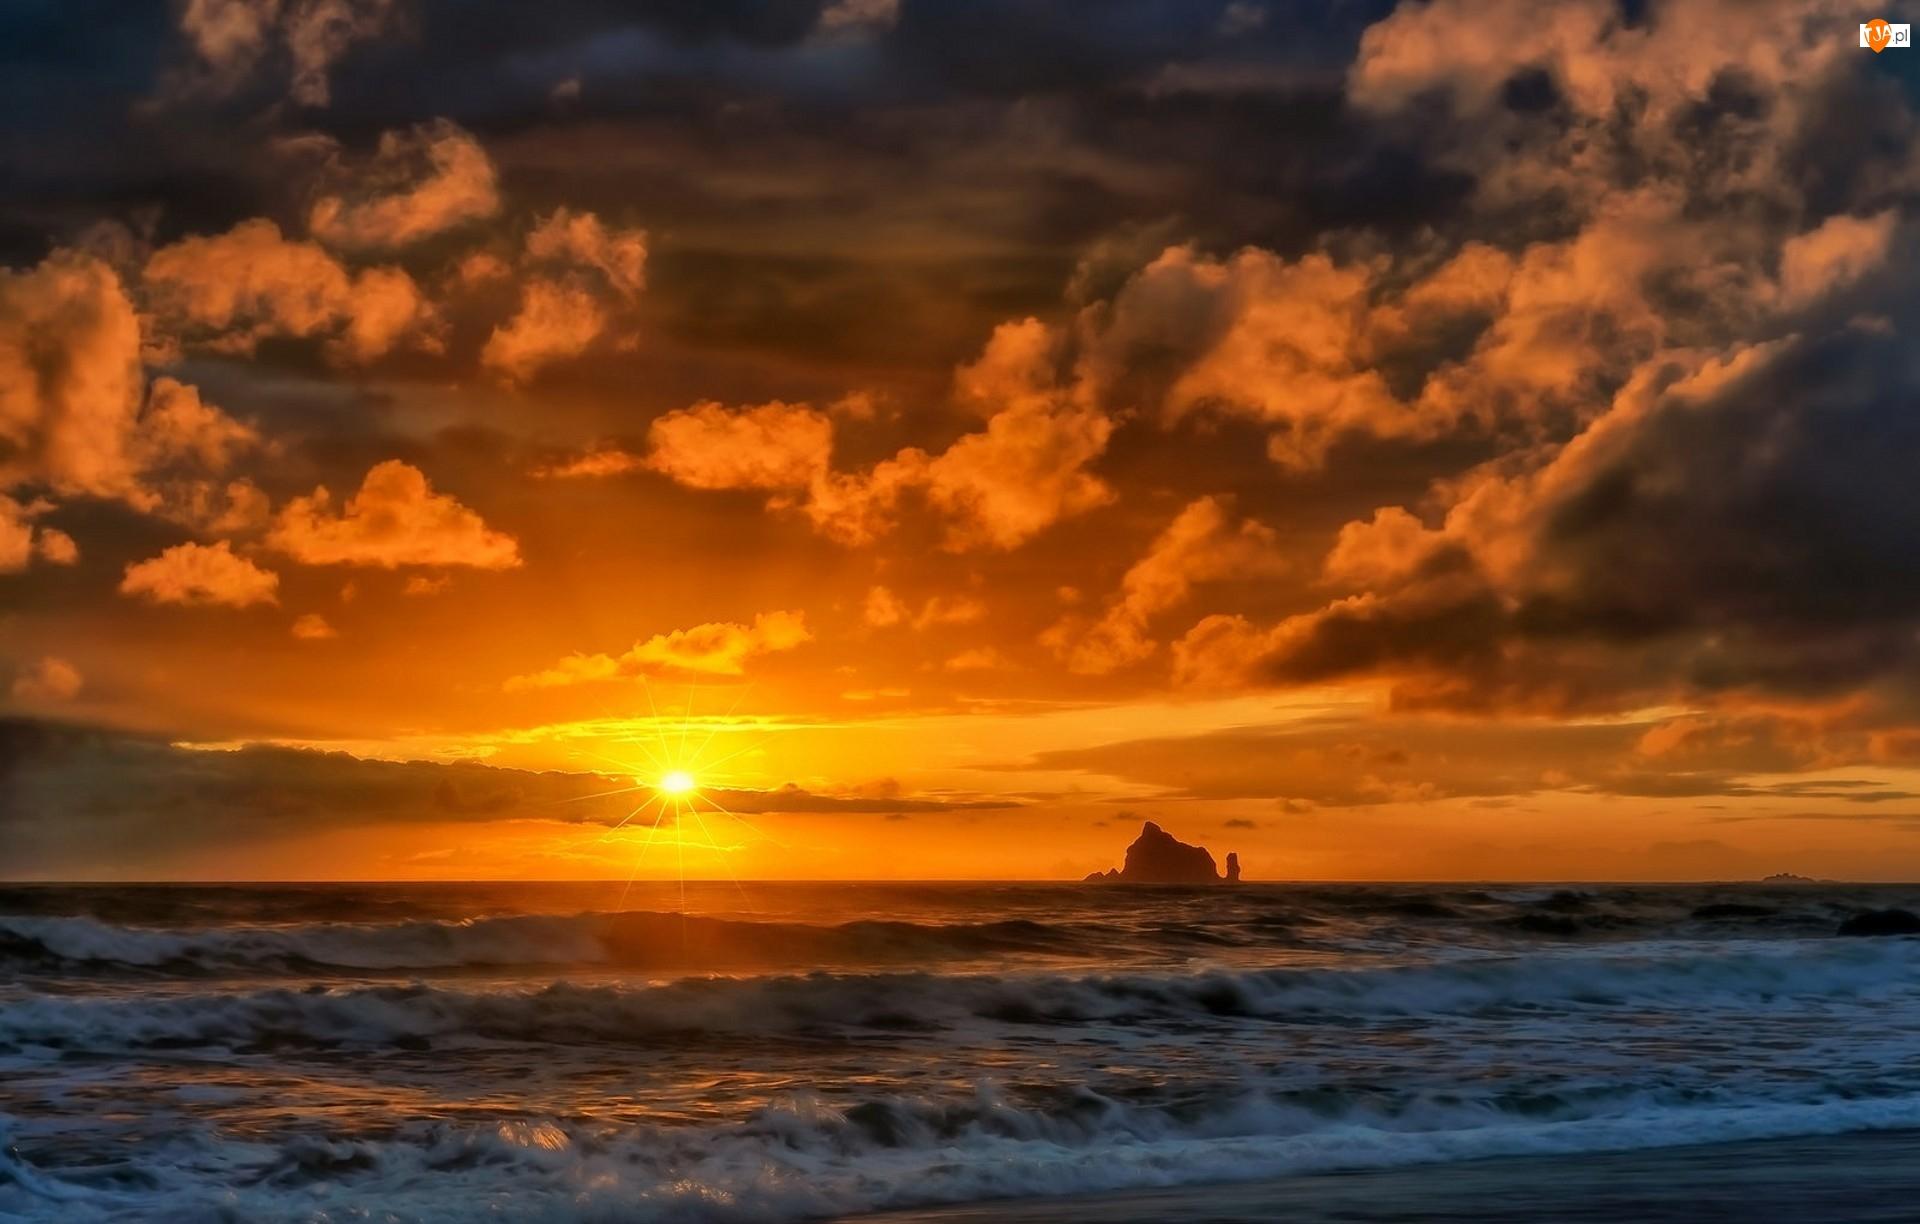 Zachód słońca, Morze, Chmury, Skały, Fale